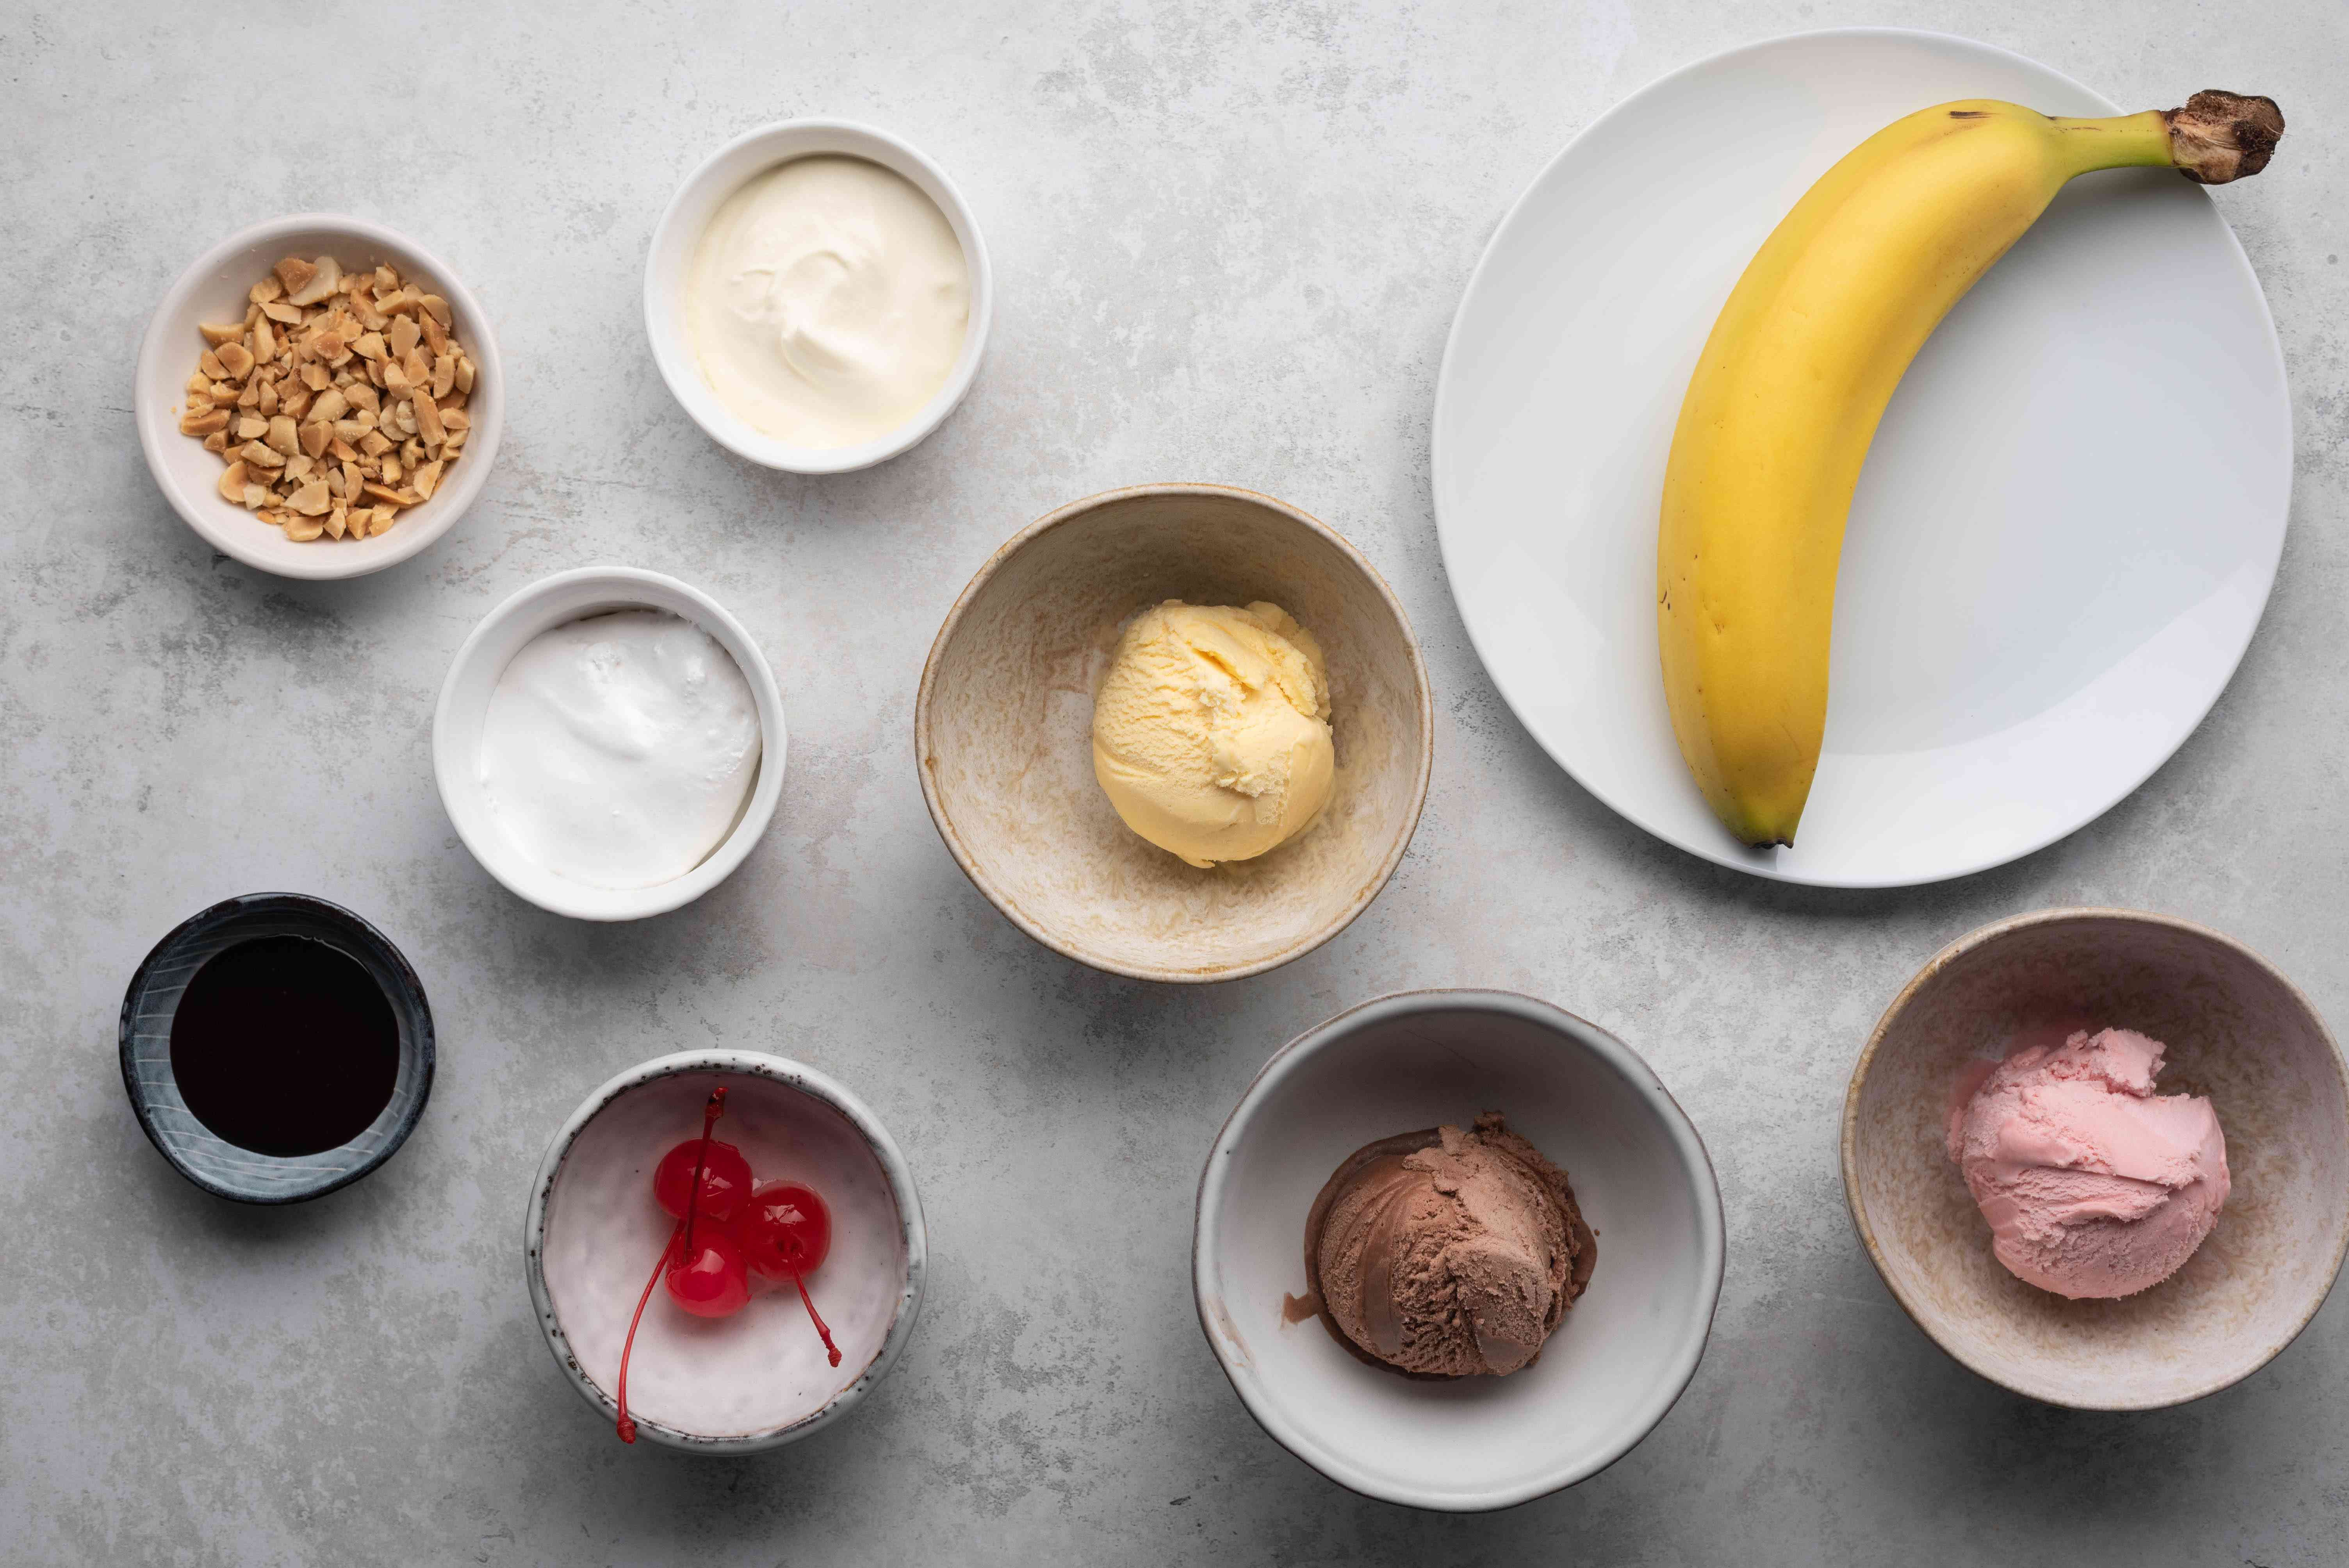 Ingredients for making a banana split